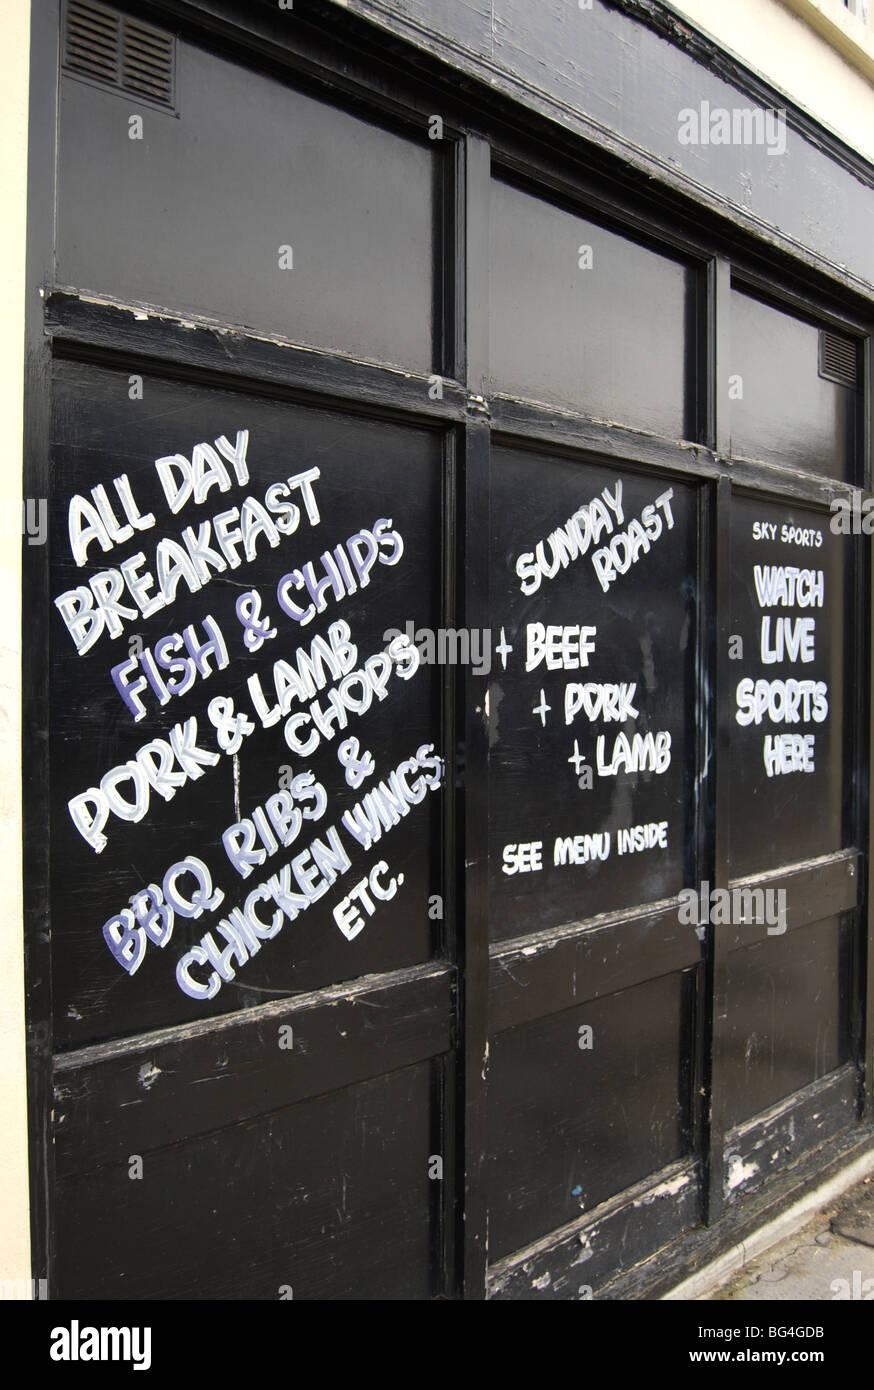 pub food menu chalked onto a wall of a disused pub in shepherds bush, london, england - Stock Image